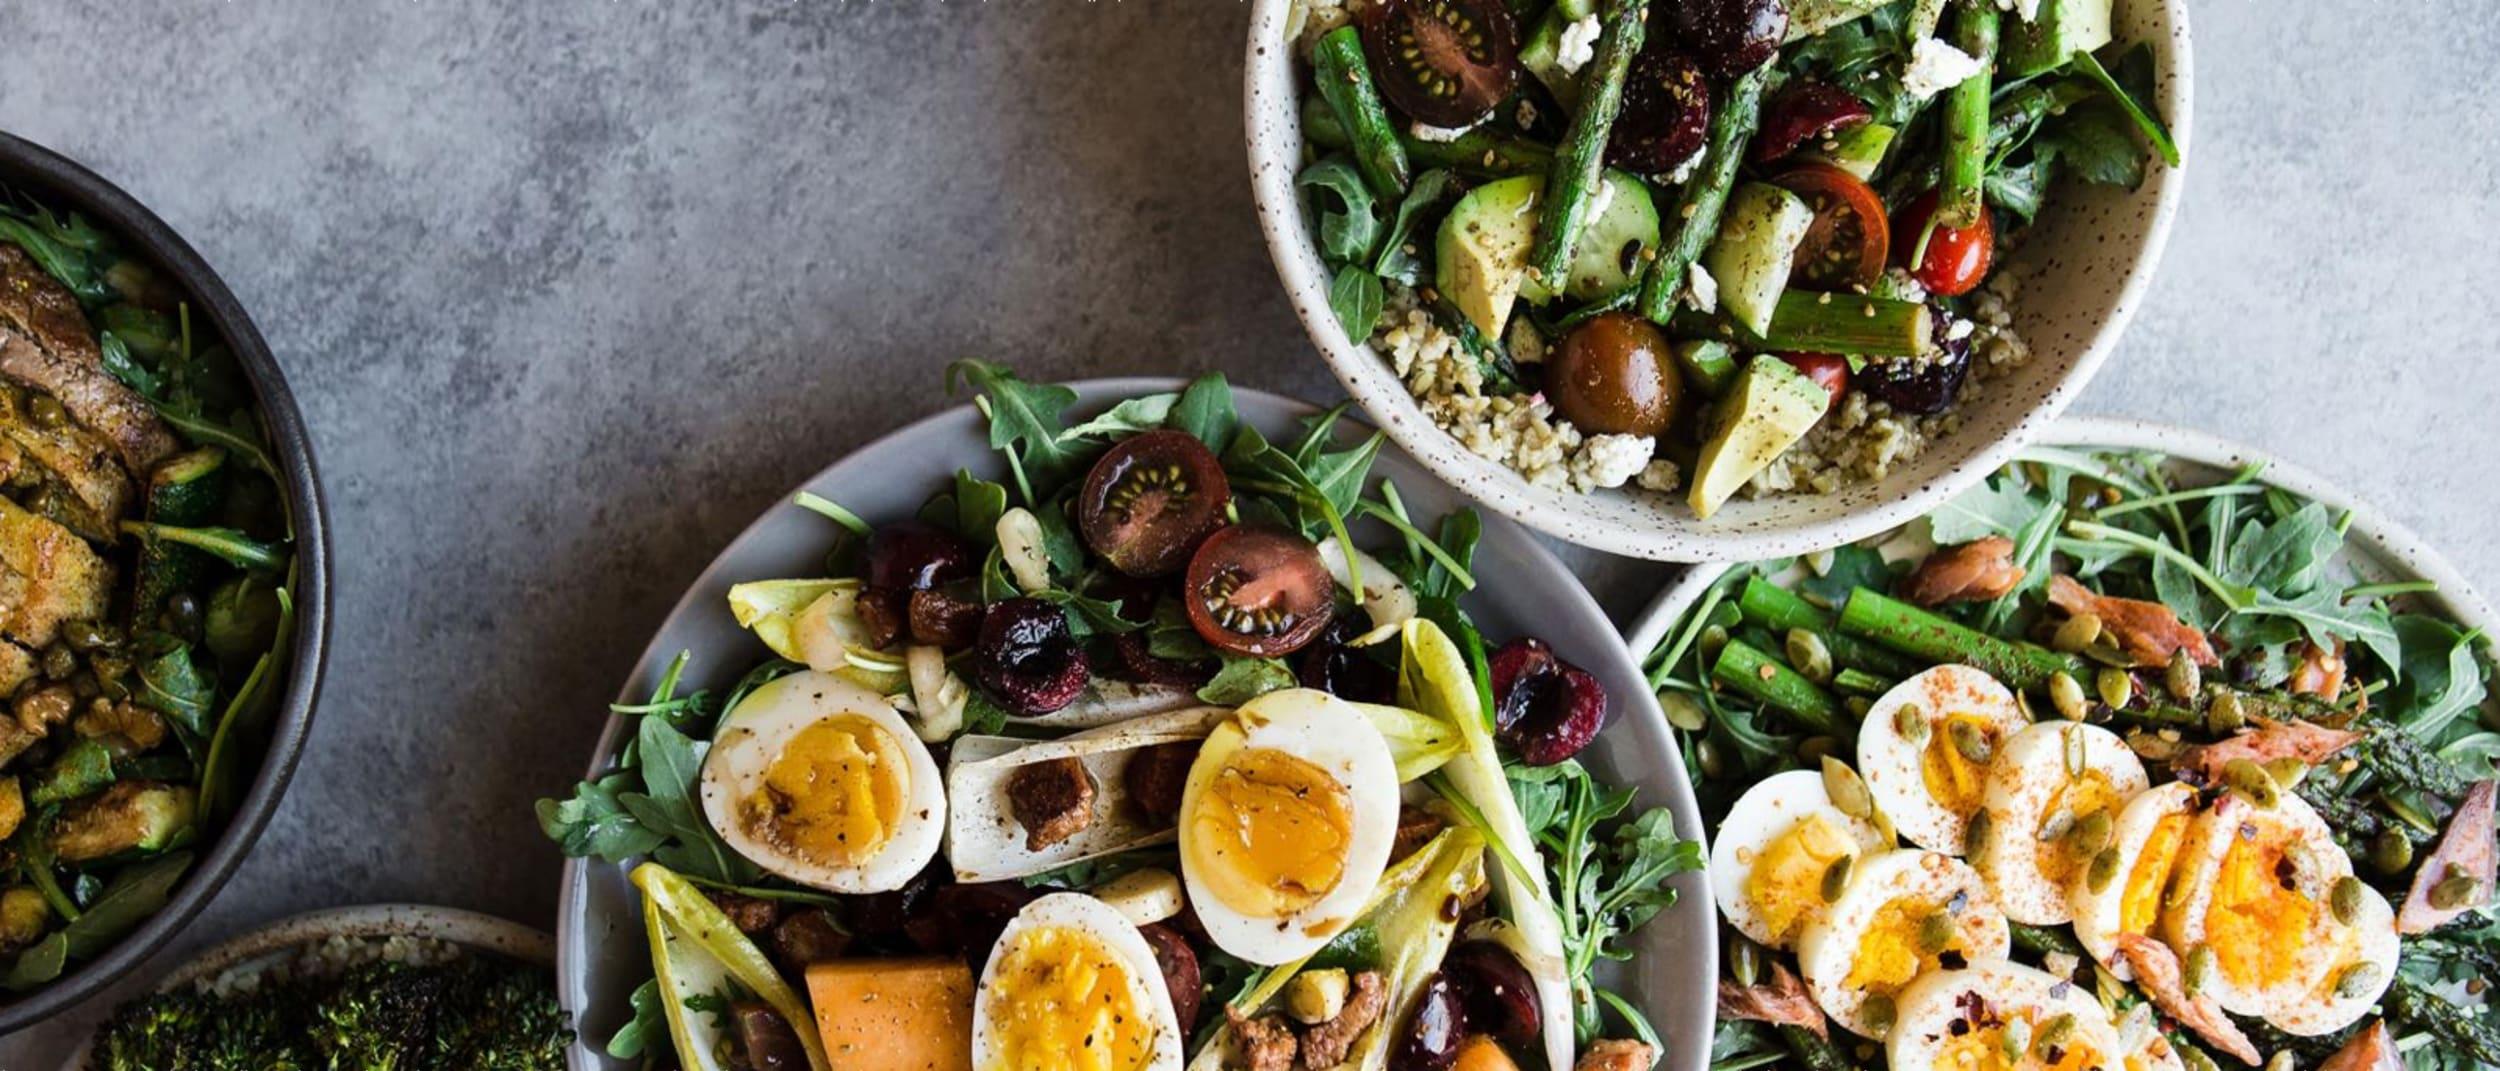 Yogabar: $10 gluten free breakfast